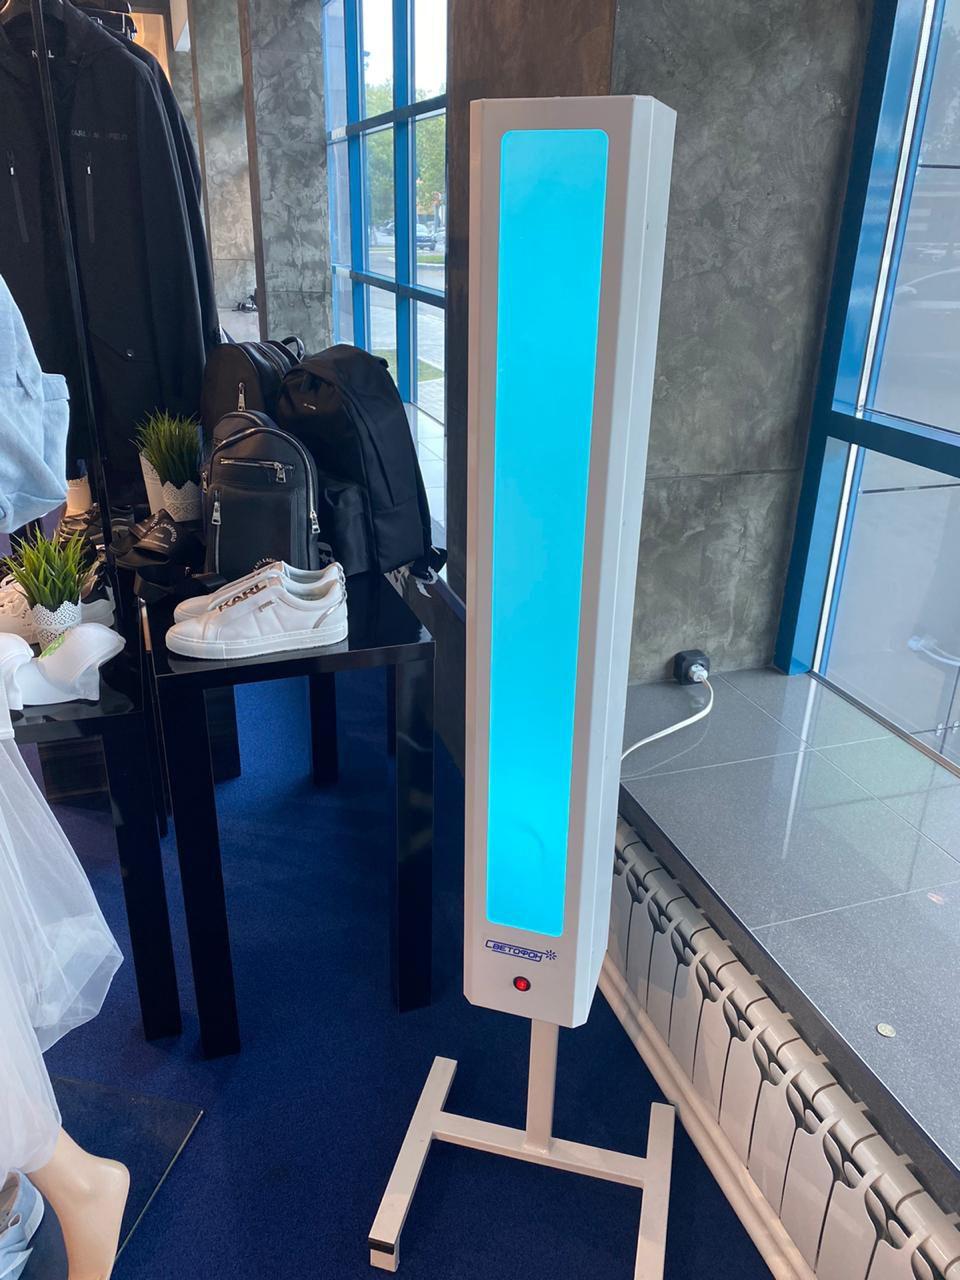 Бактерицидные лампы Казань